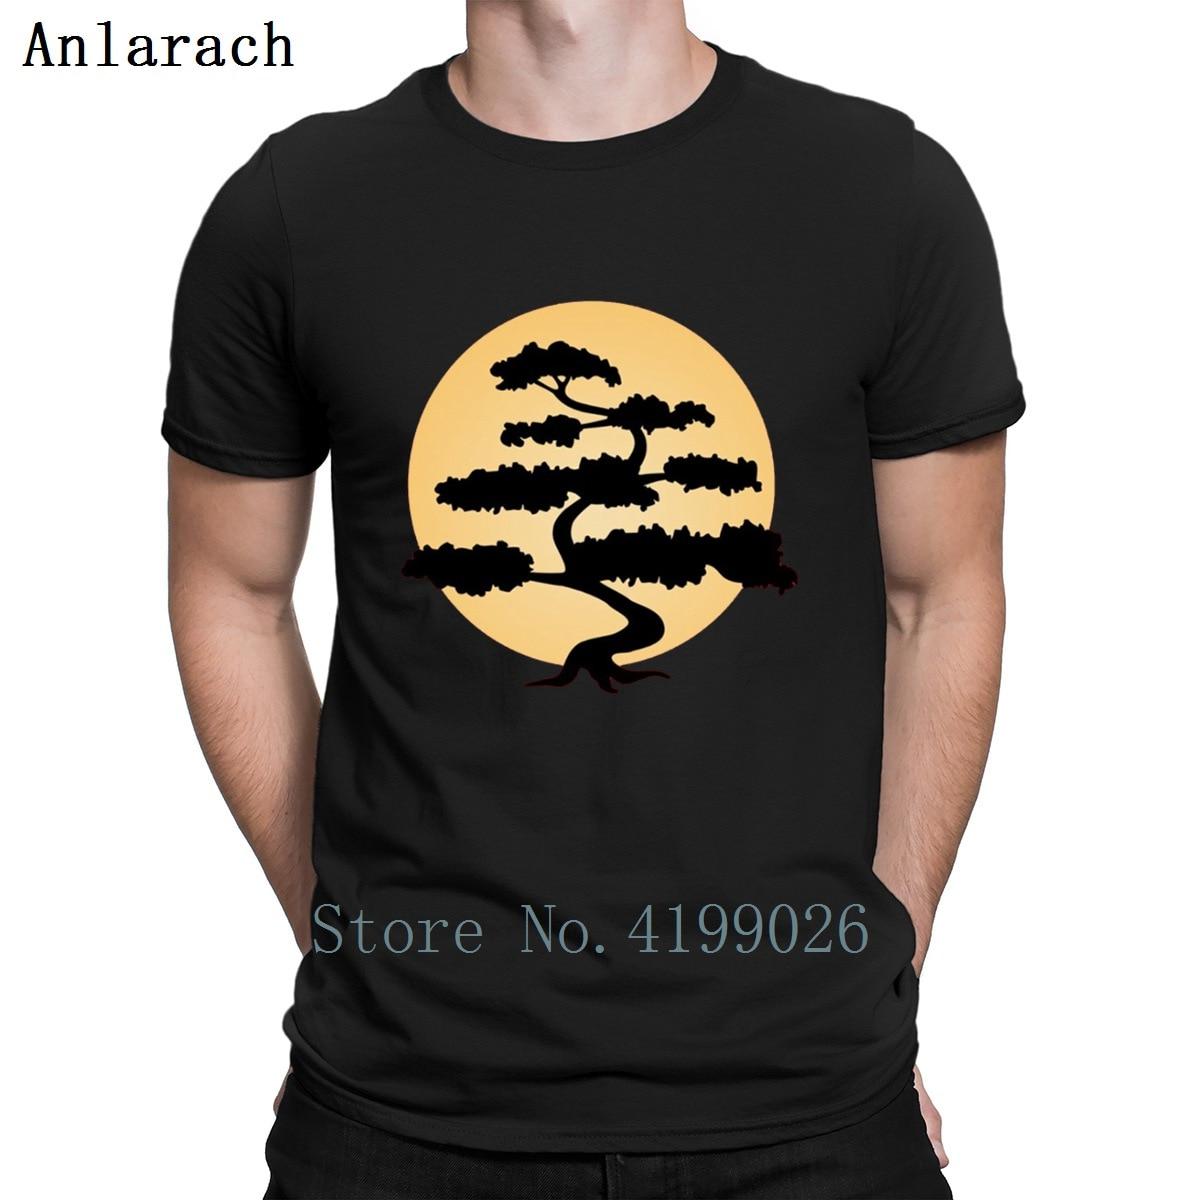 Bonsai árbol de Halloween camiseta limitada Camiseta de punto Top Camiseta ajustada cuello redondo personalizado camiseta interesante verano peculiar nuevo